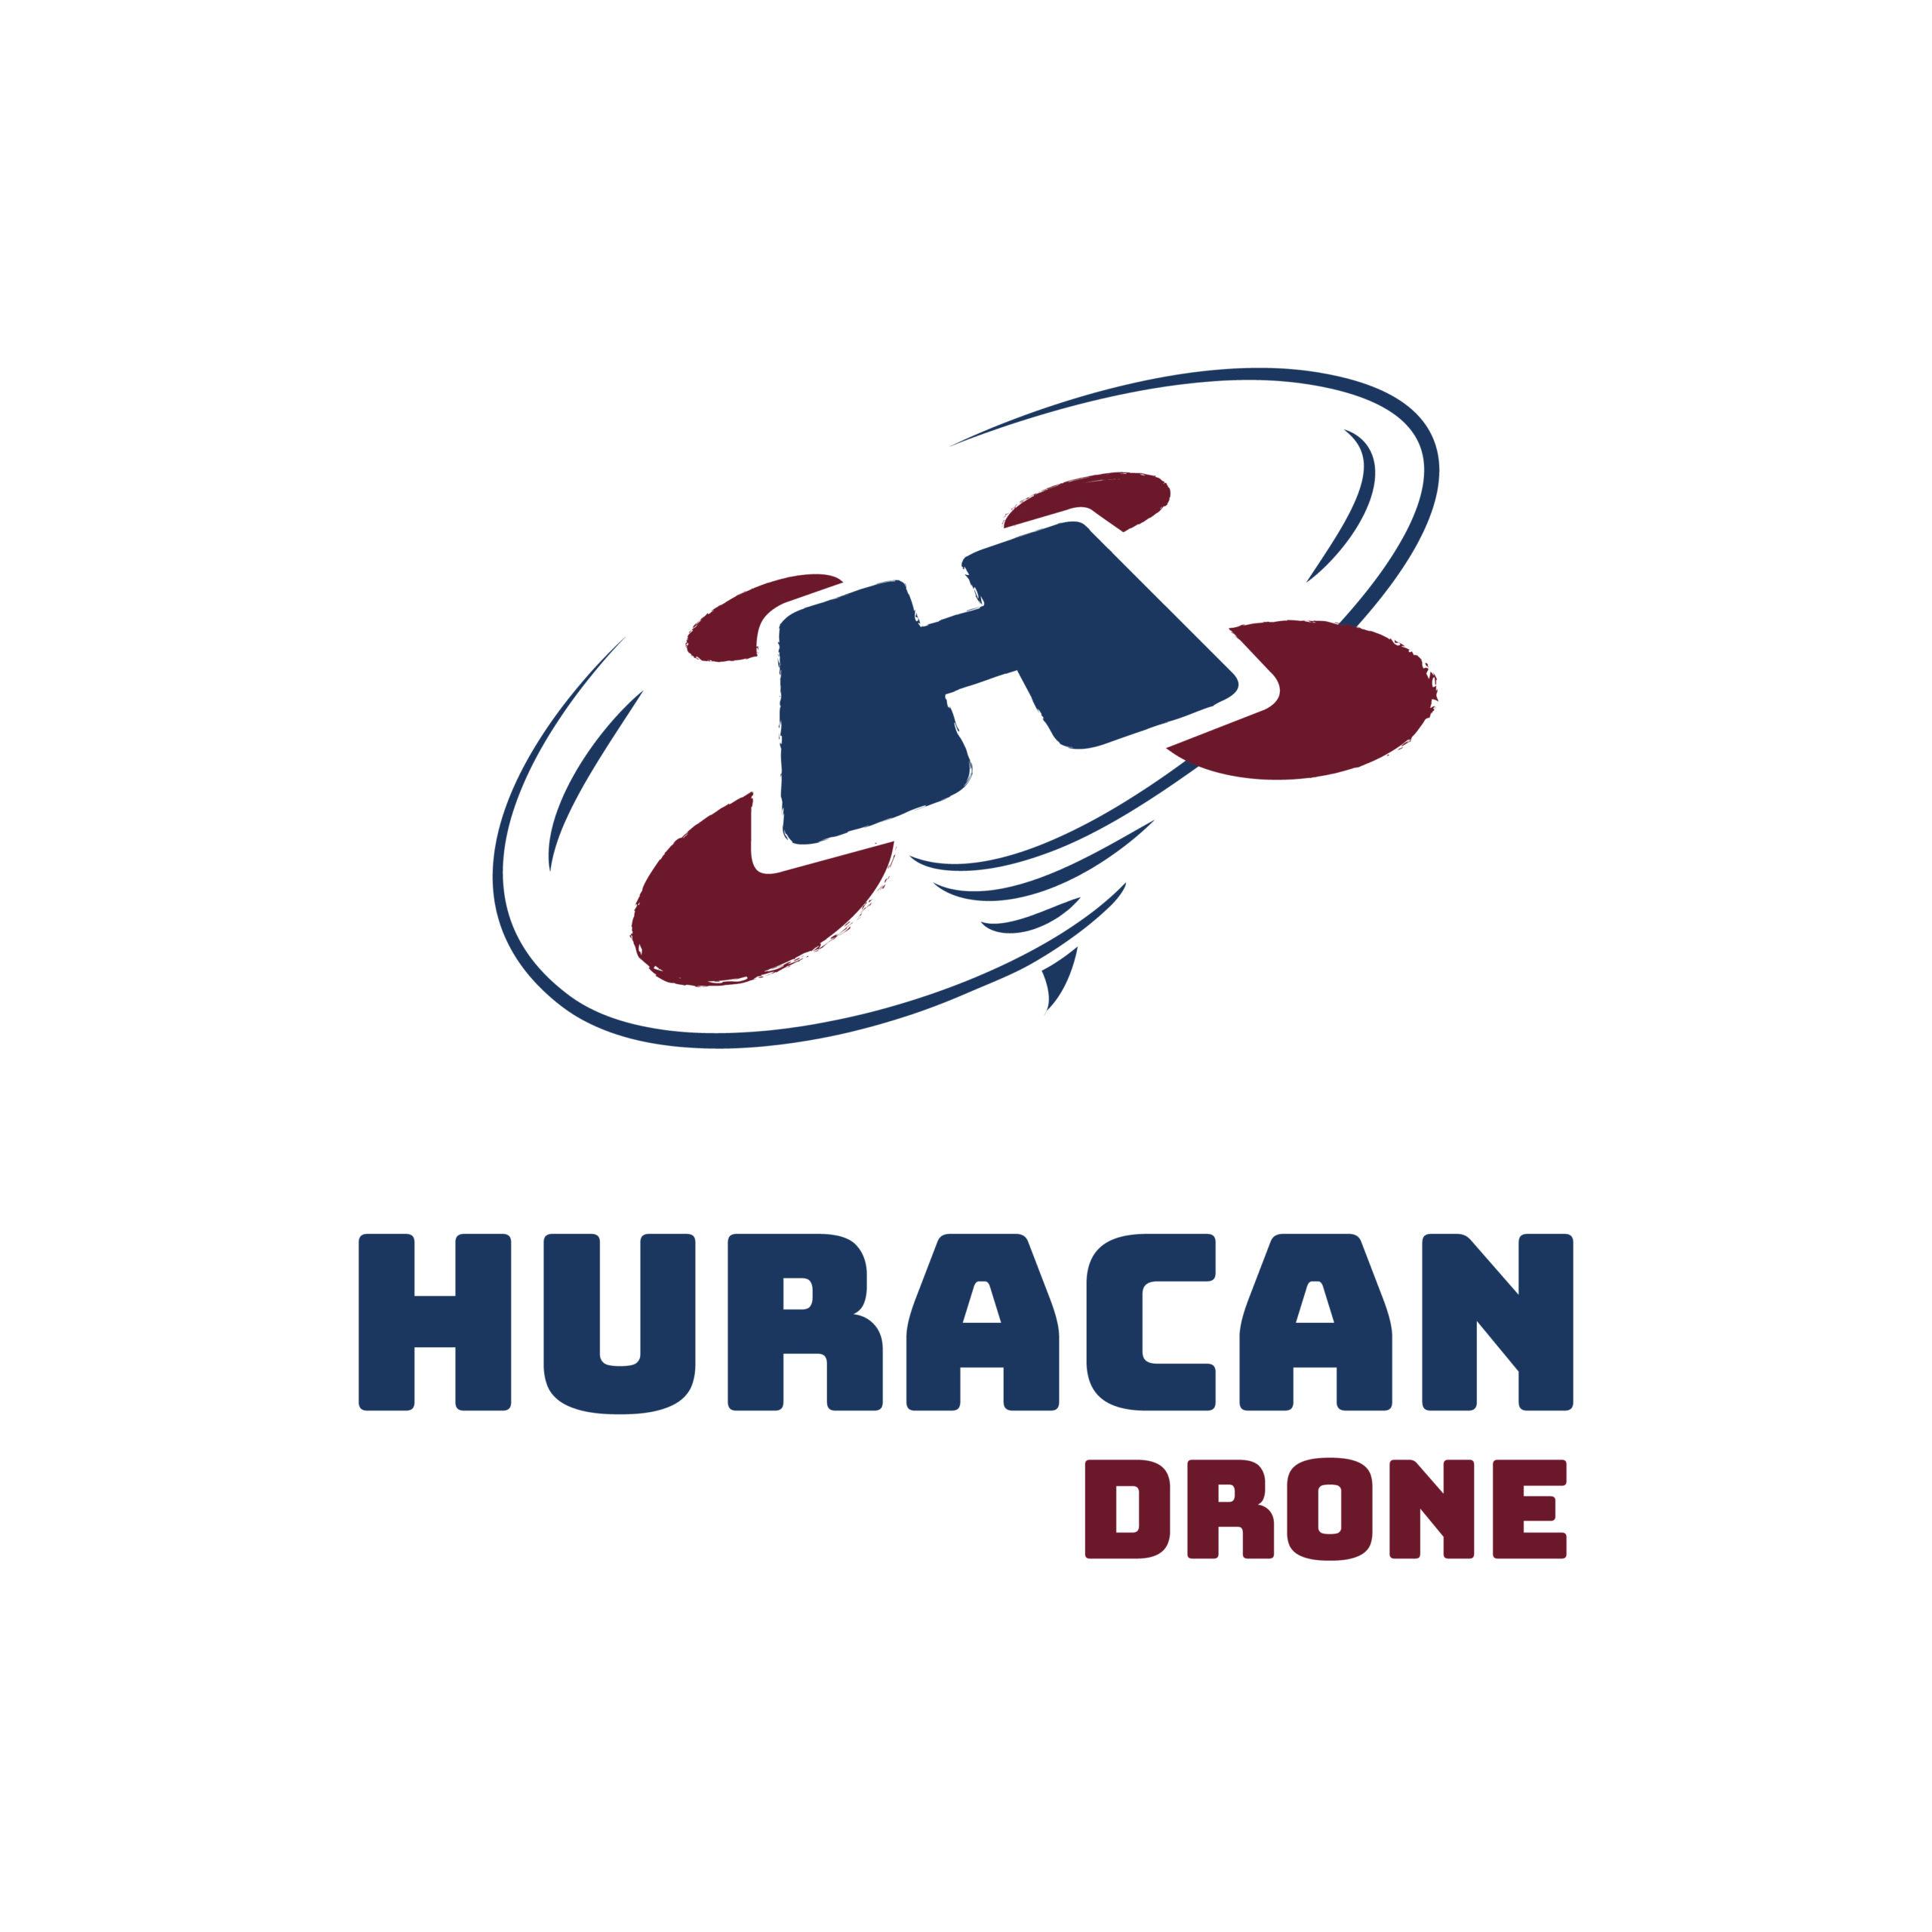 Huracan Drone